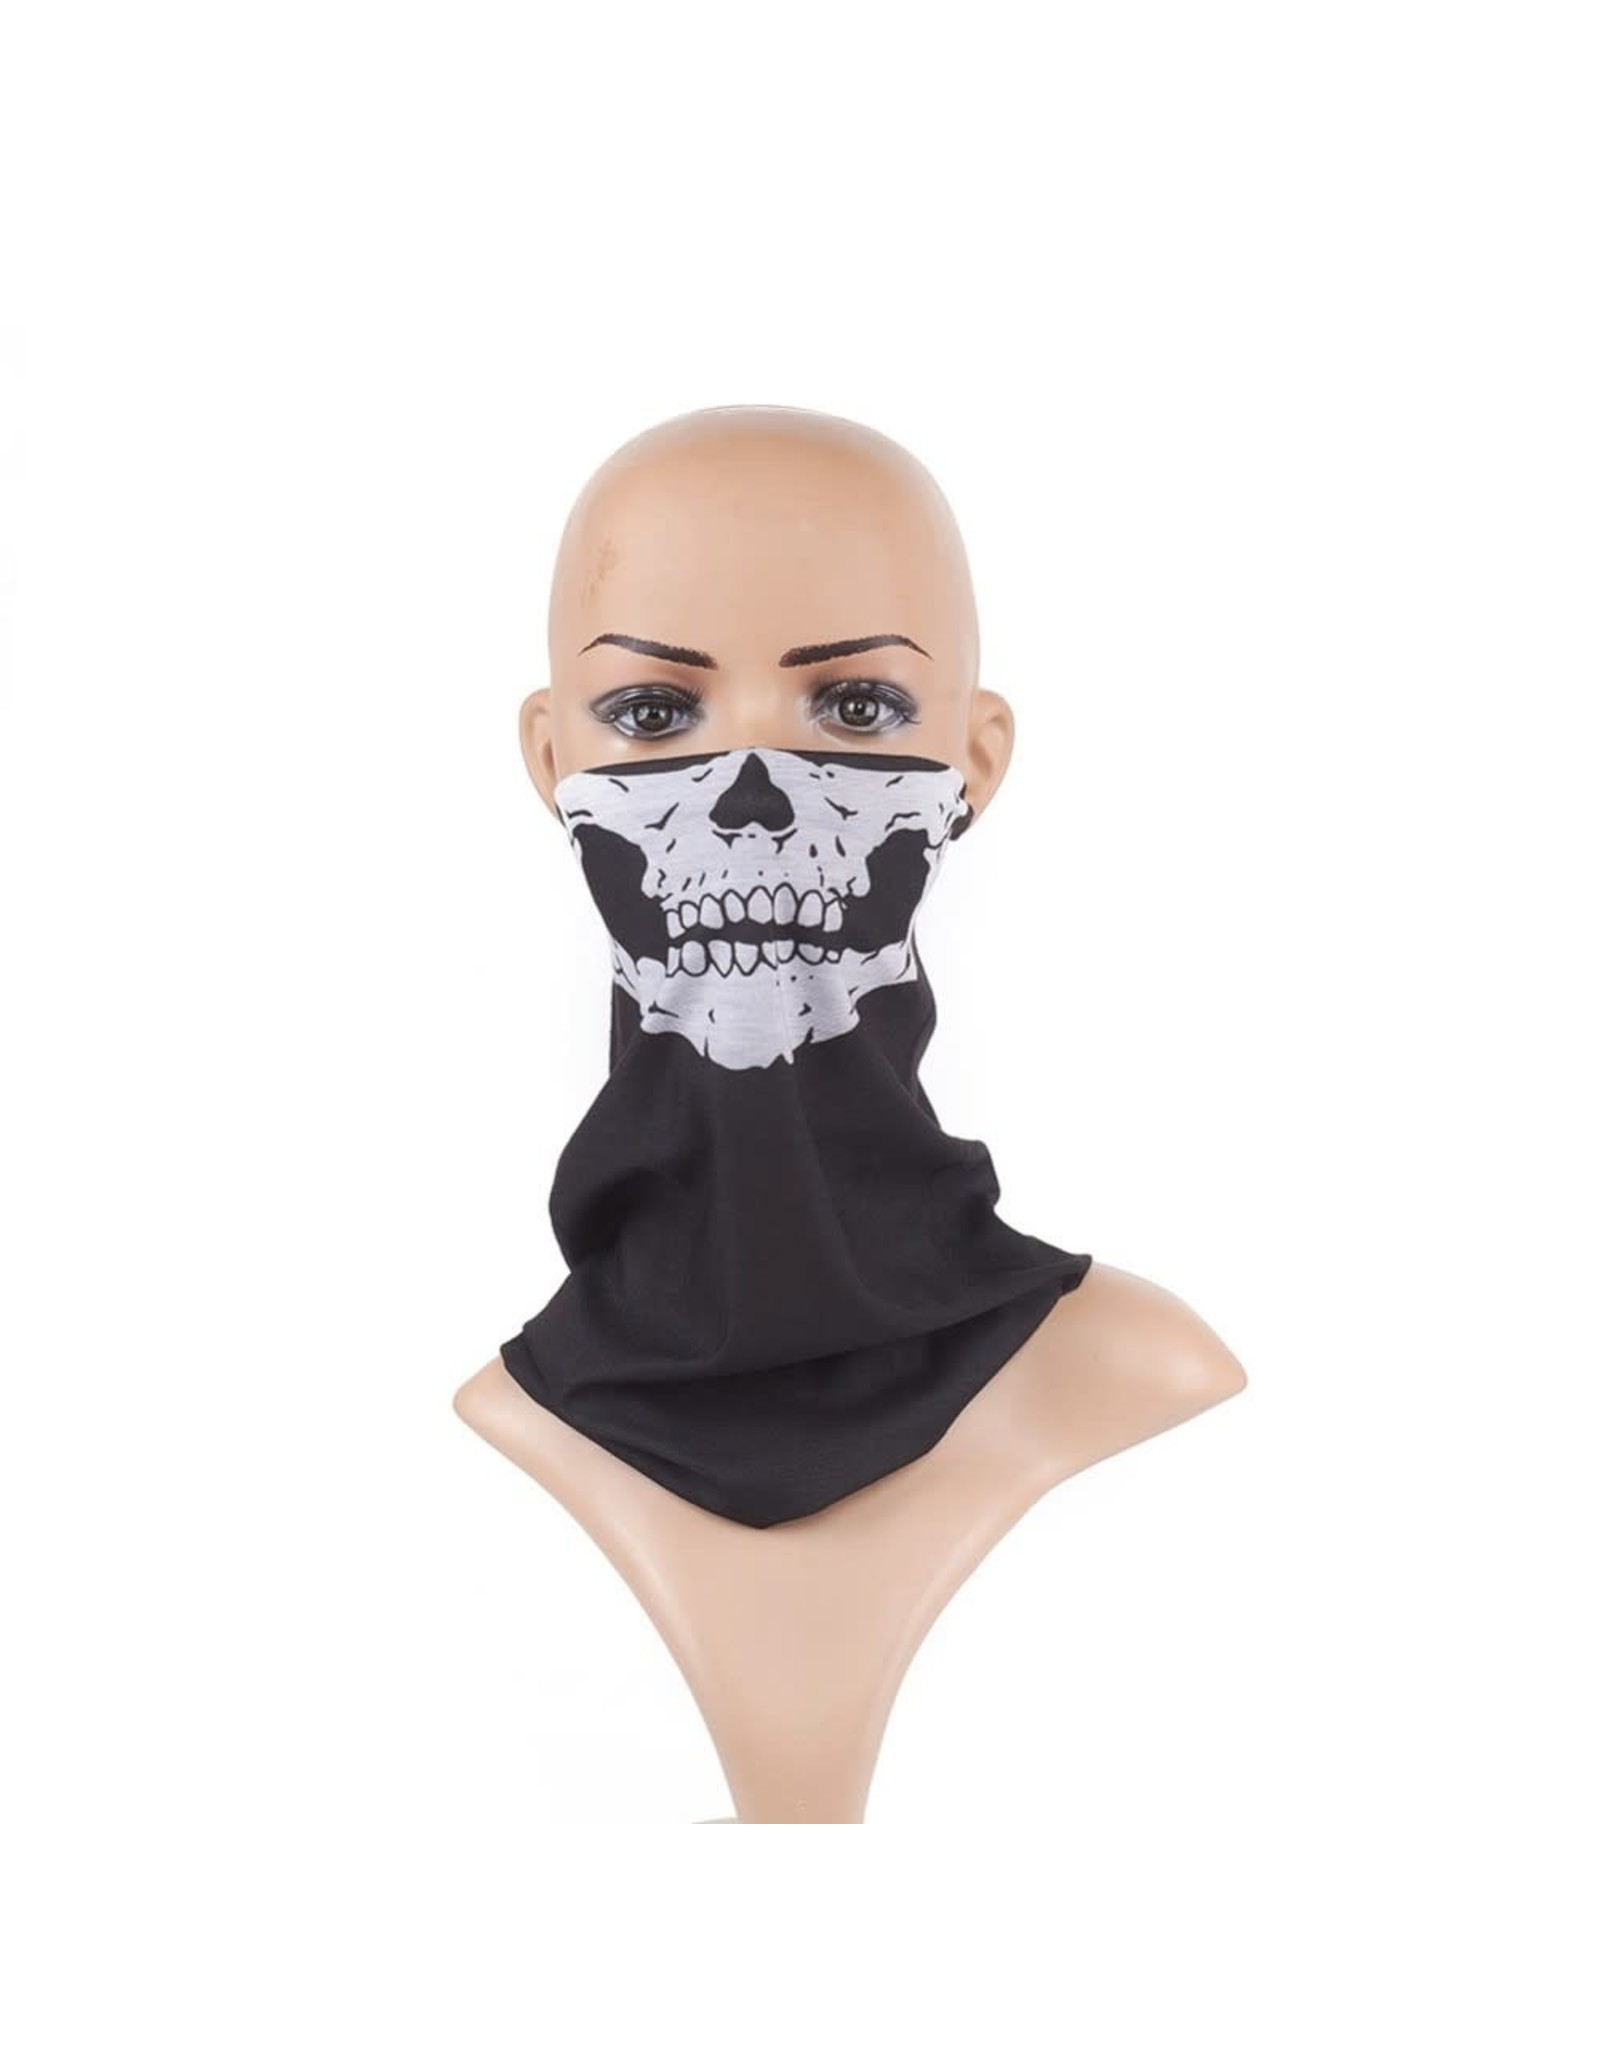 Headband Bandana 24x48cm Black/White Skull Face